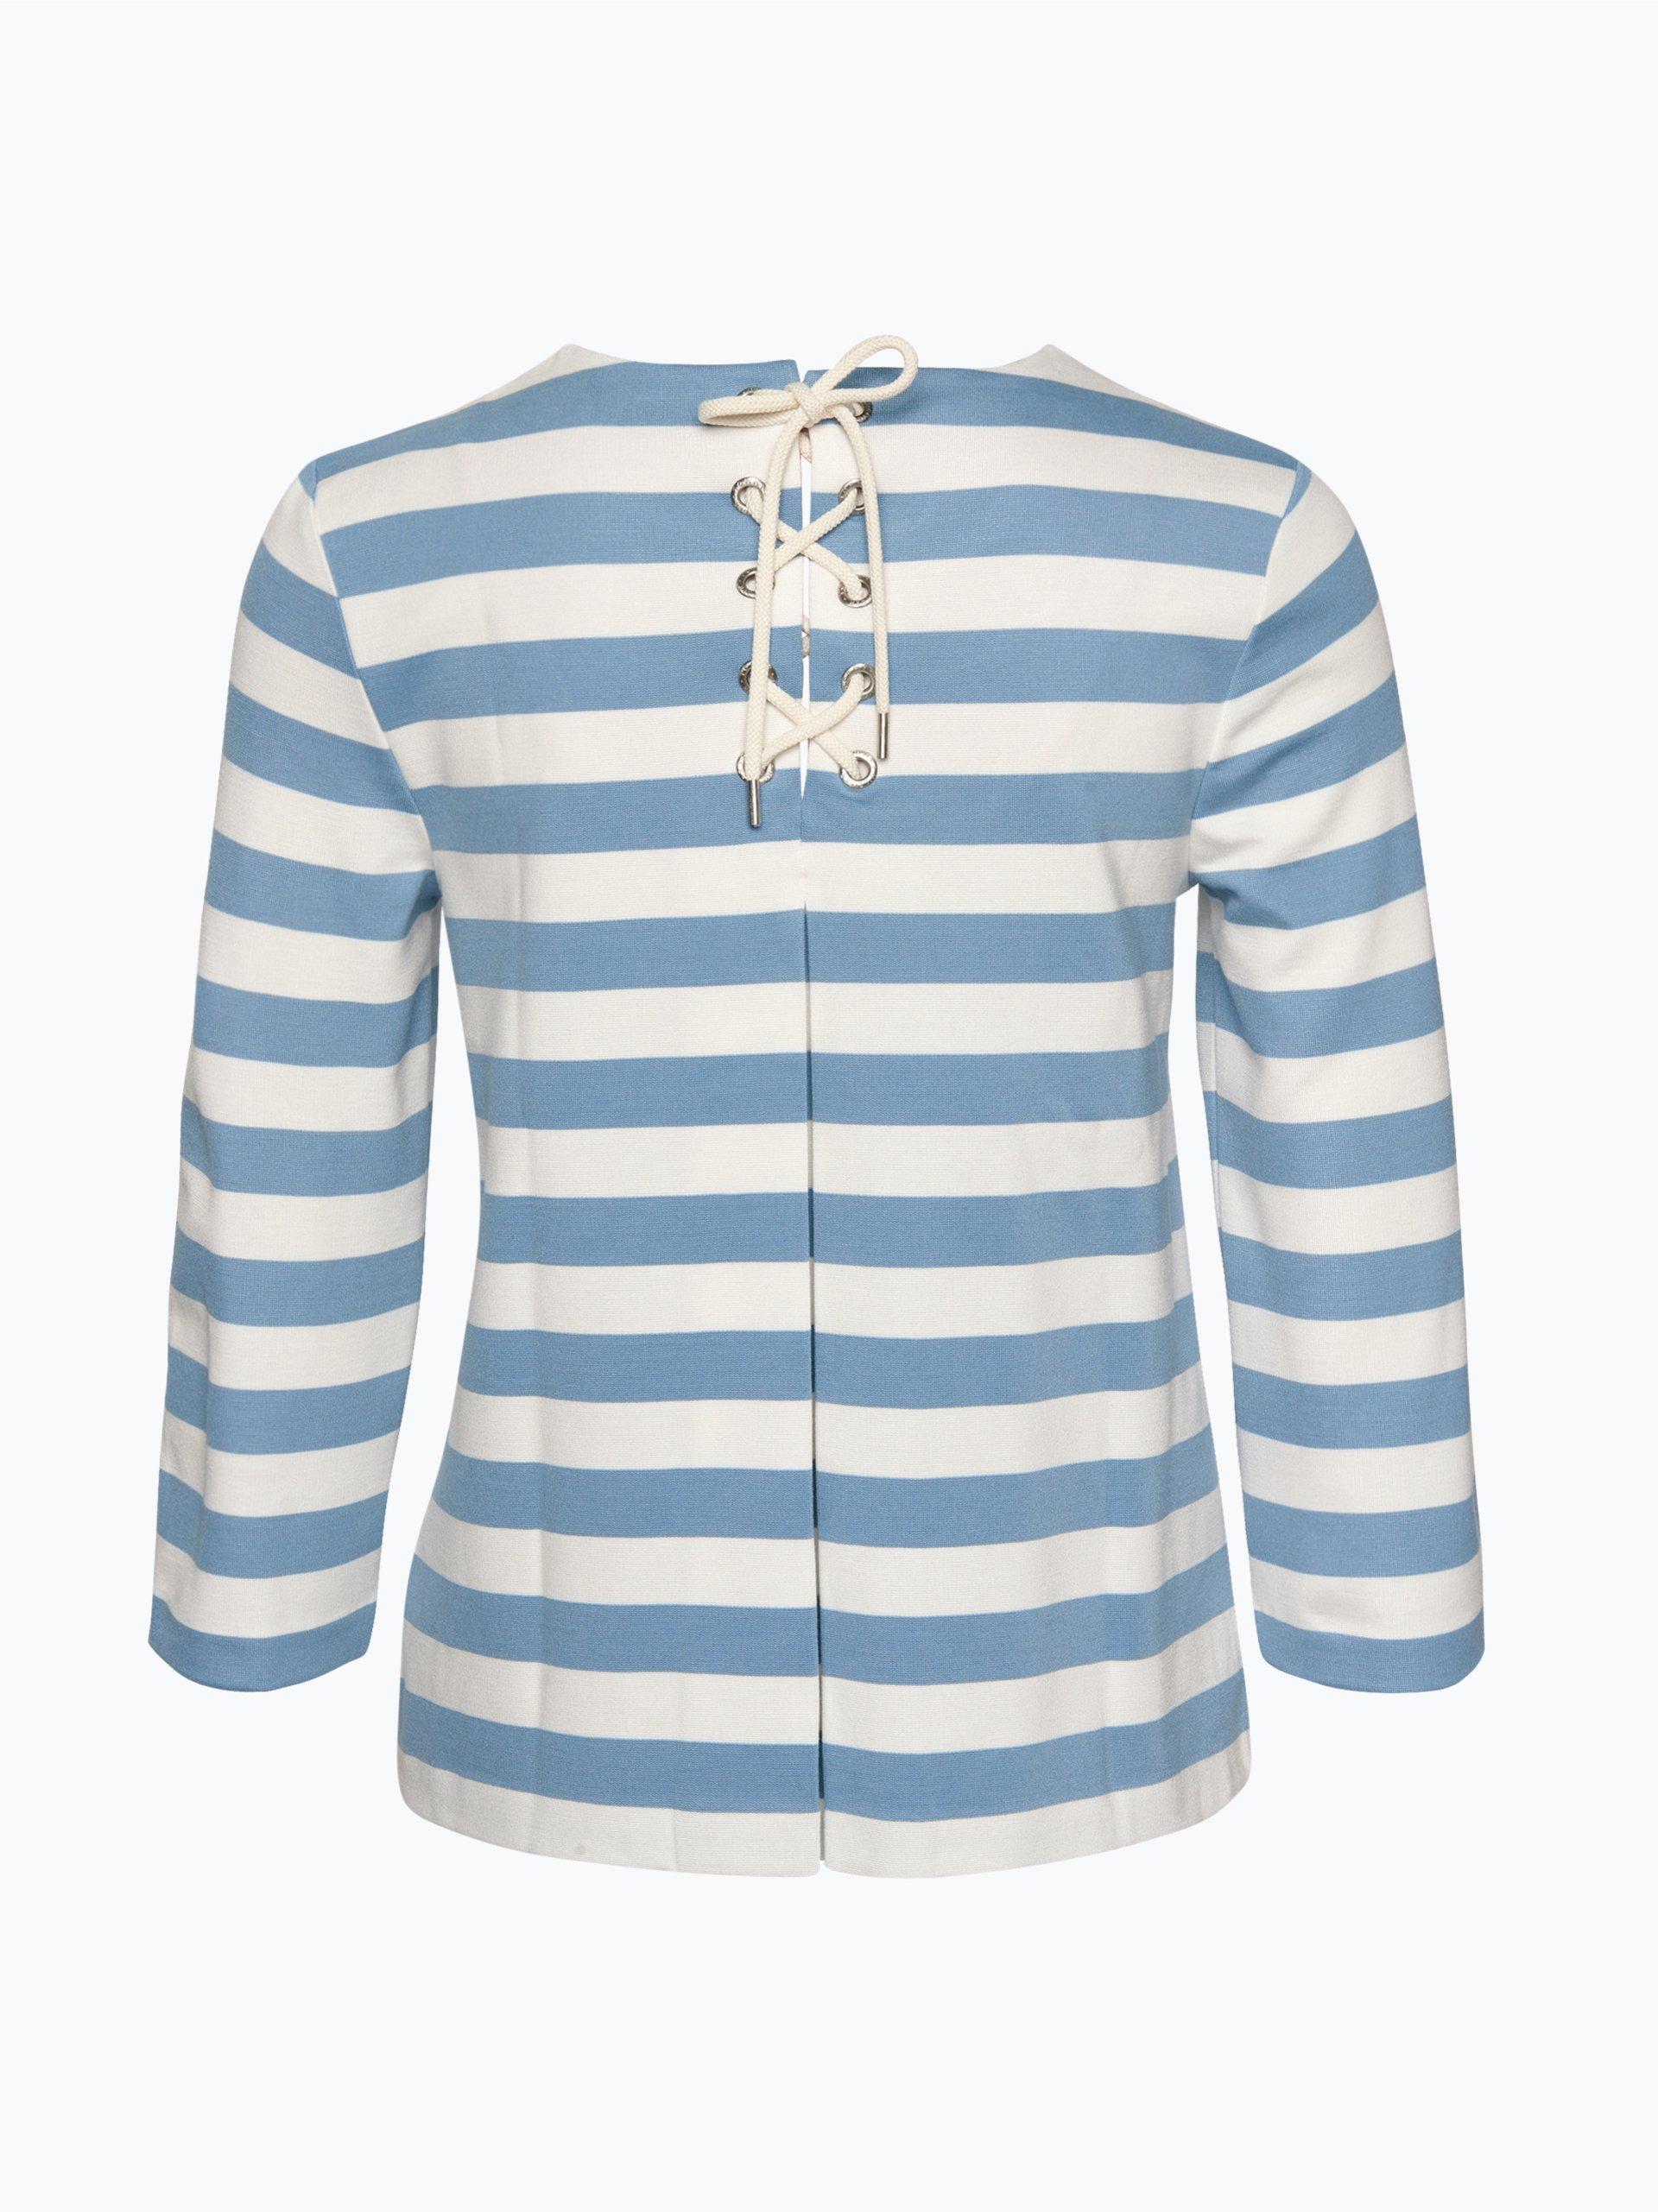 tommy hilfiger damen shirt linnet online kaufen peek. Black Bedroom Furniture Sets. Home Design Ideas